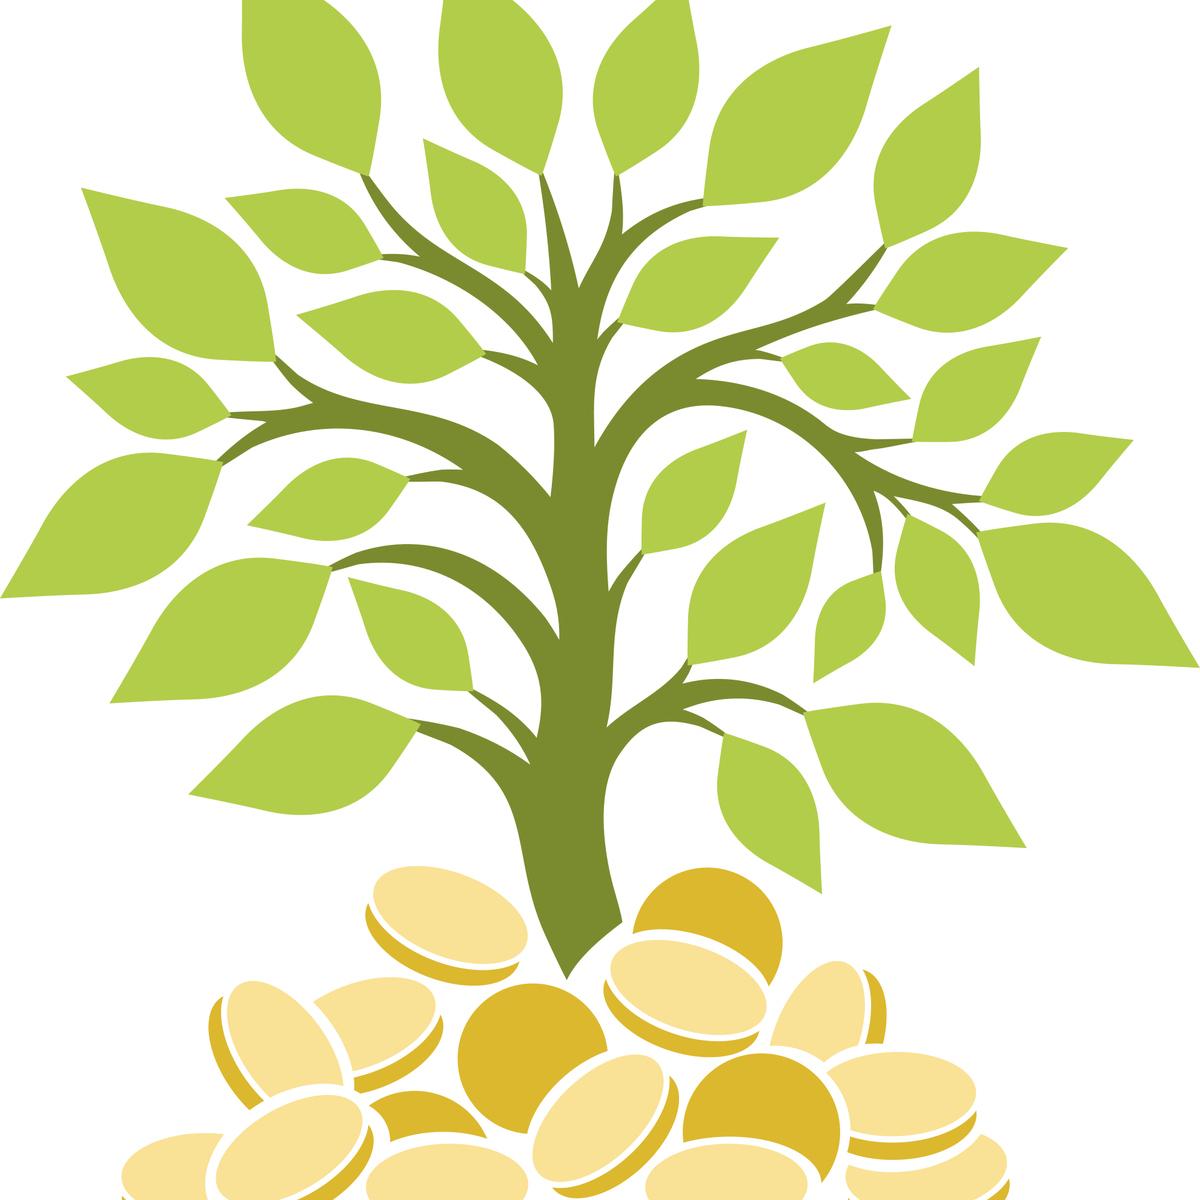 La Philanthropie : Comprendre et Agir course image